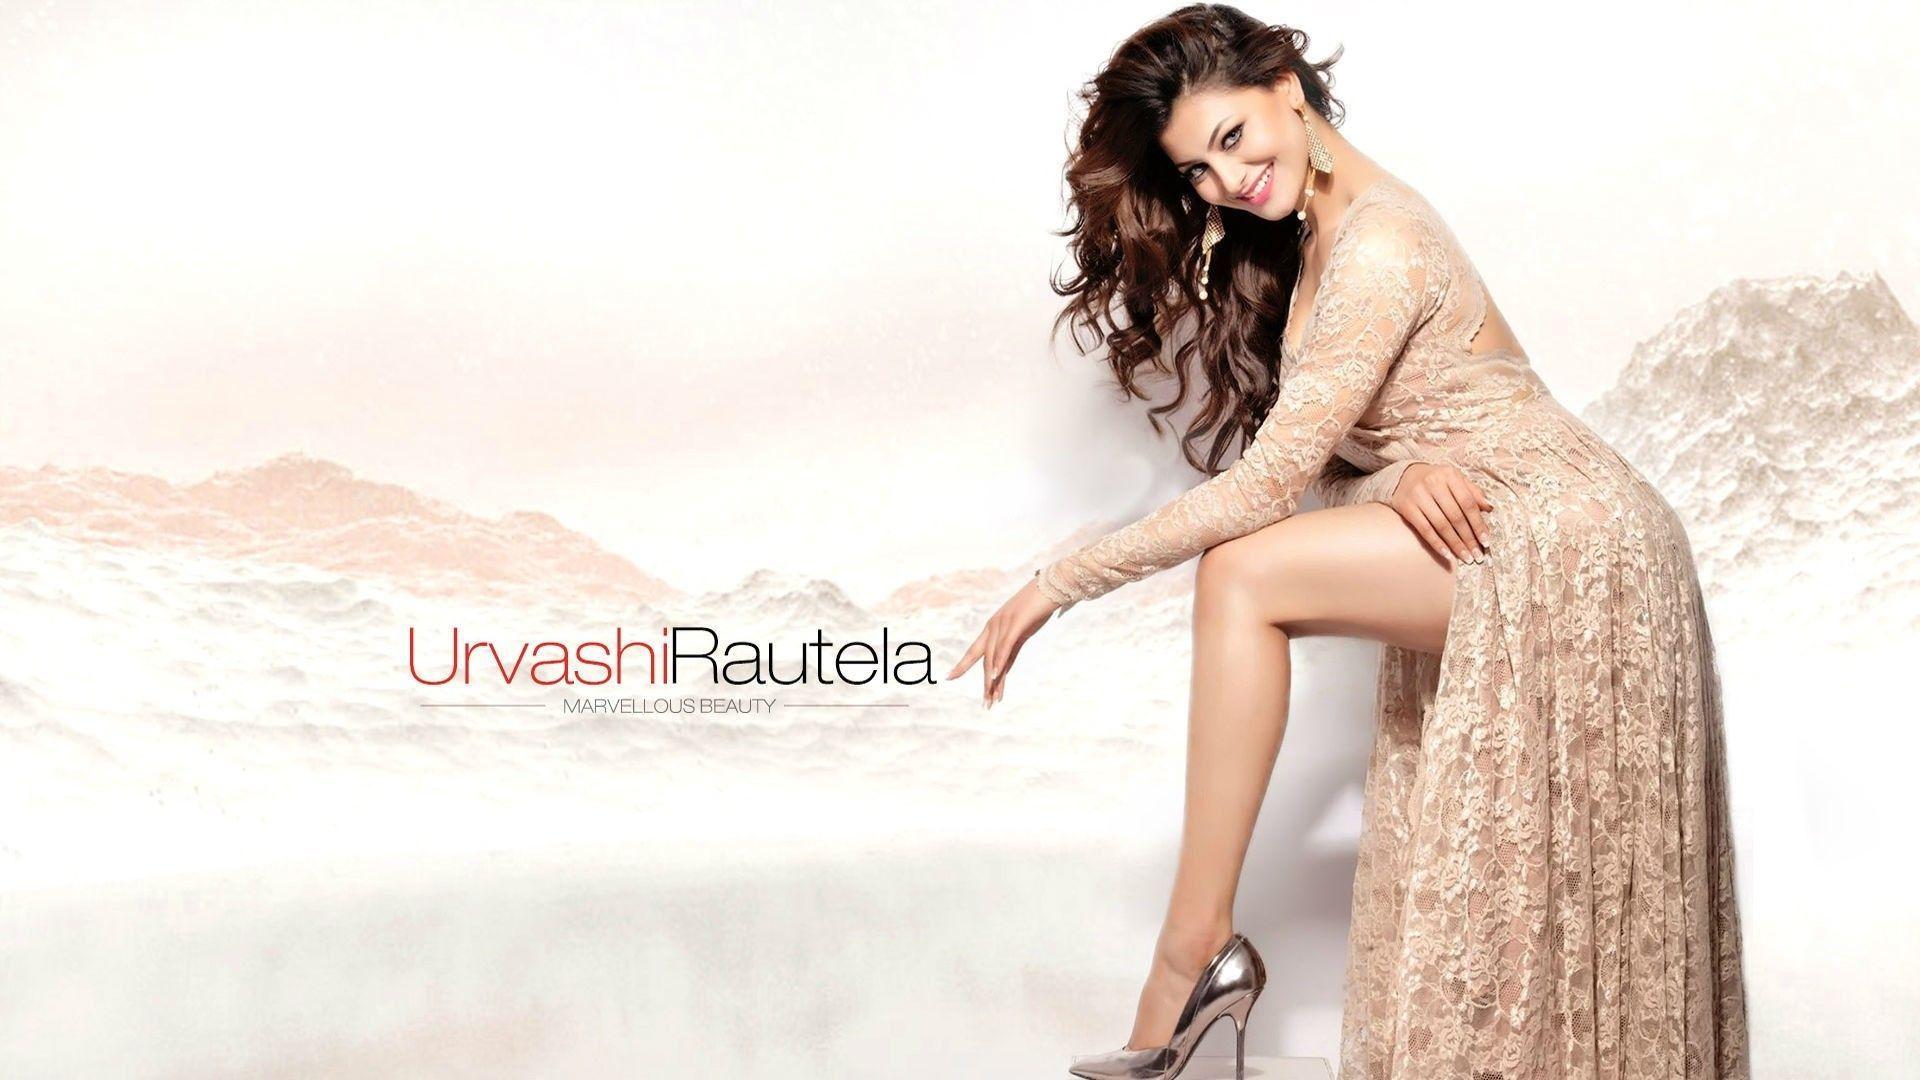 Hd wallpaper urvashi rautela - Urvashi Rautela Hd Images 9